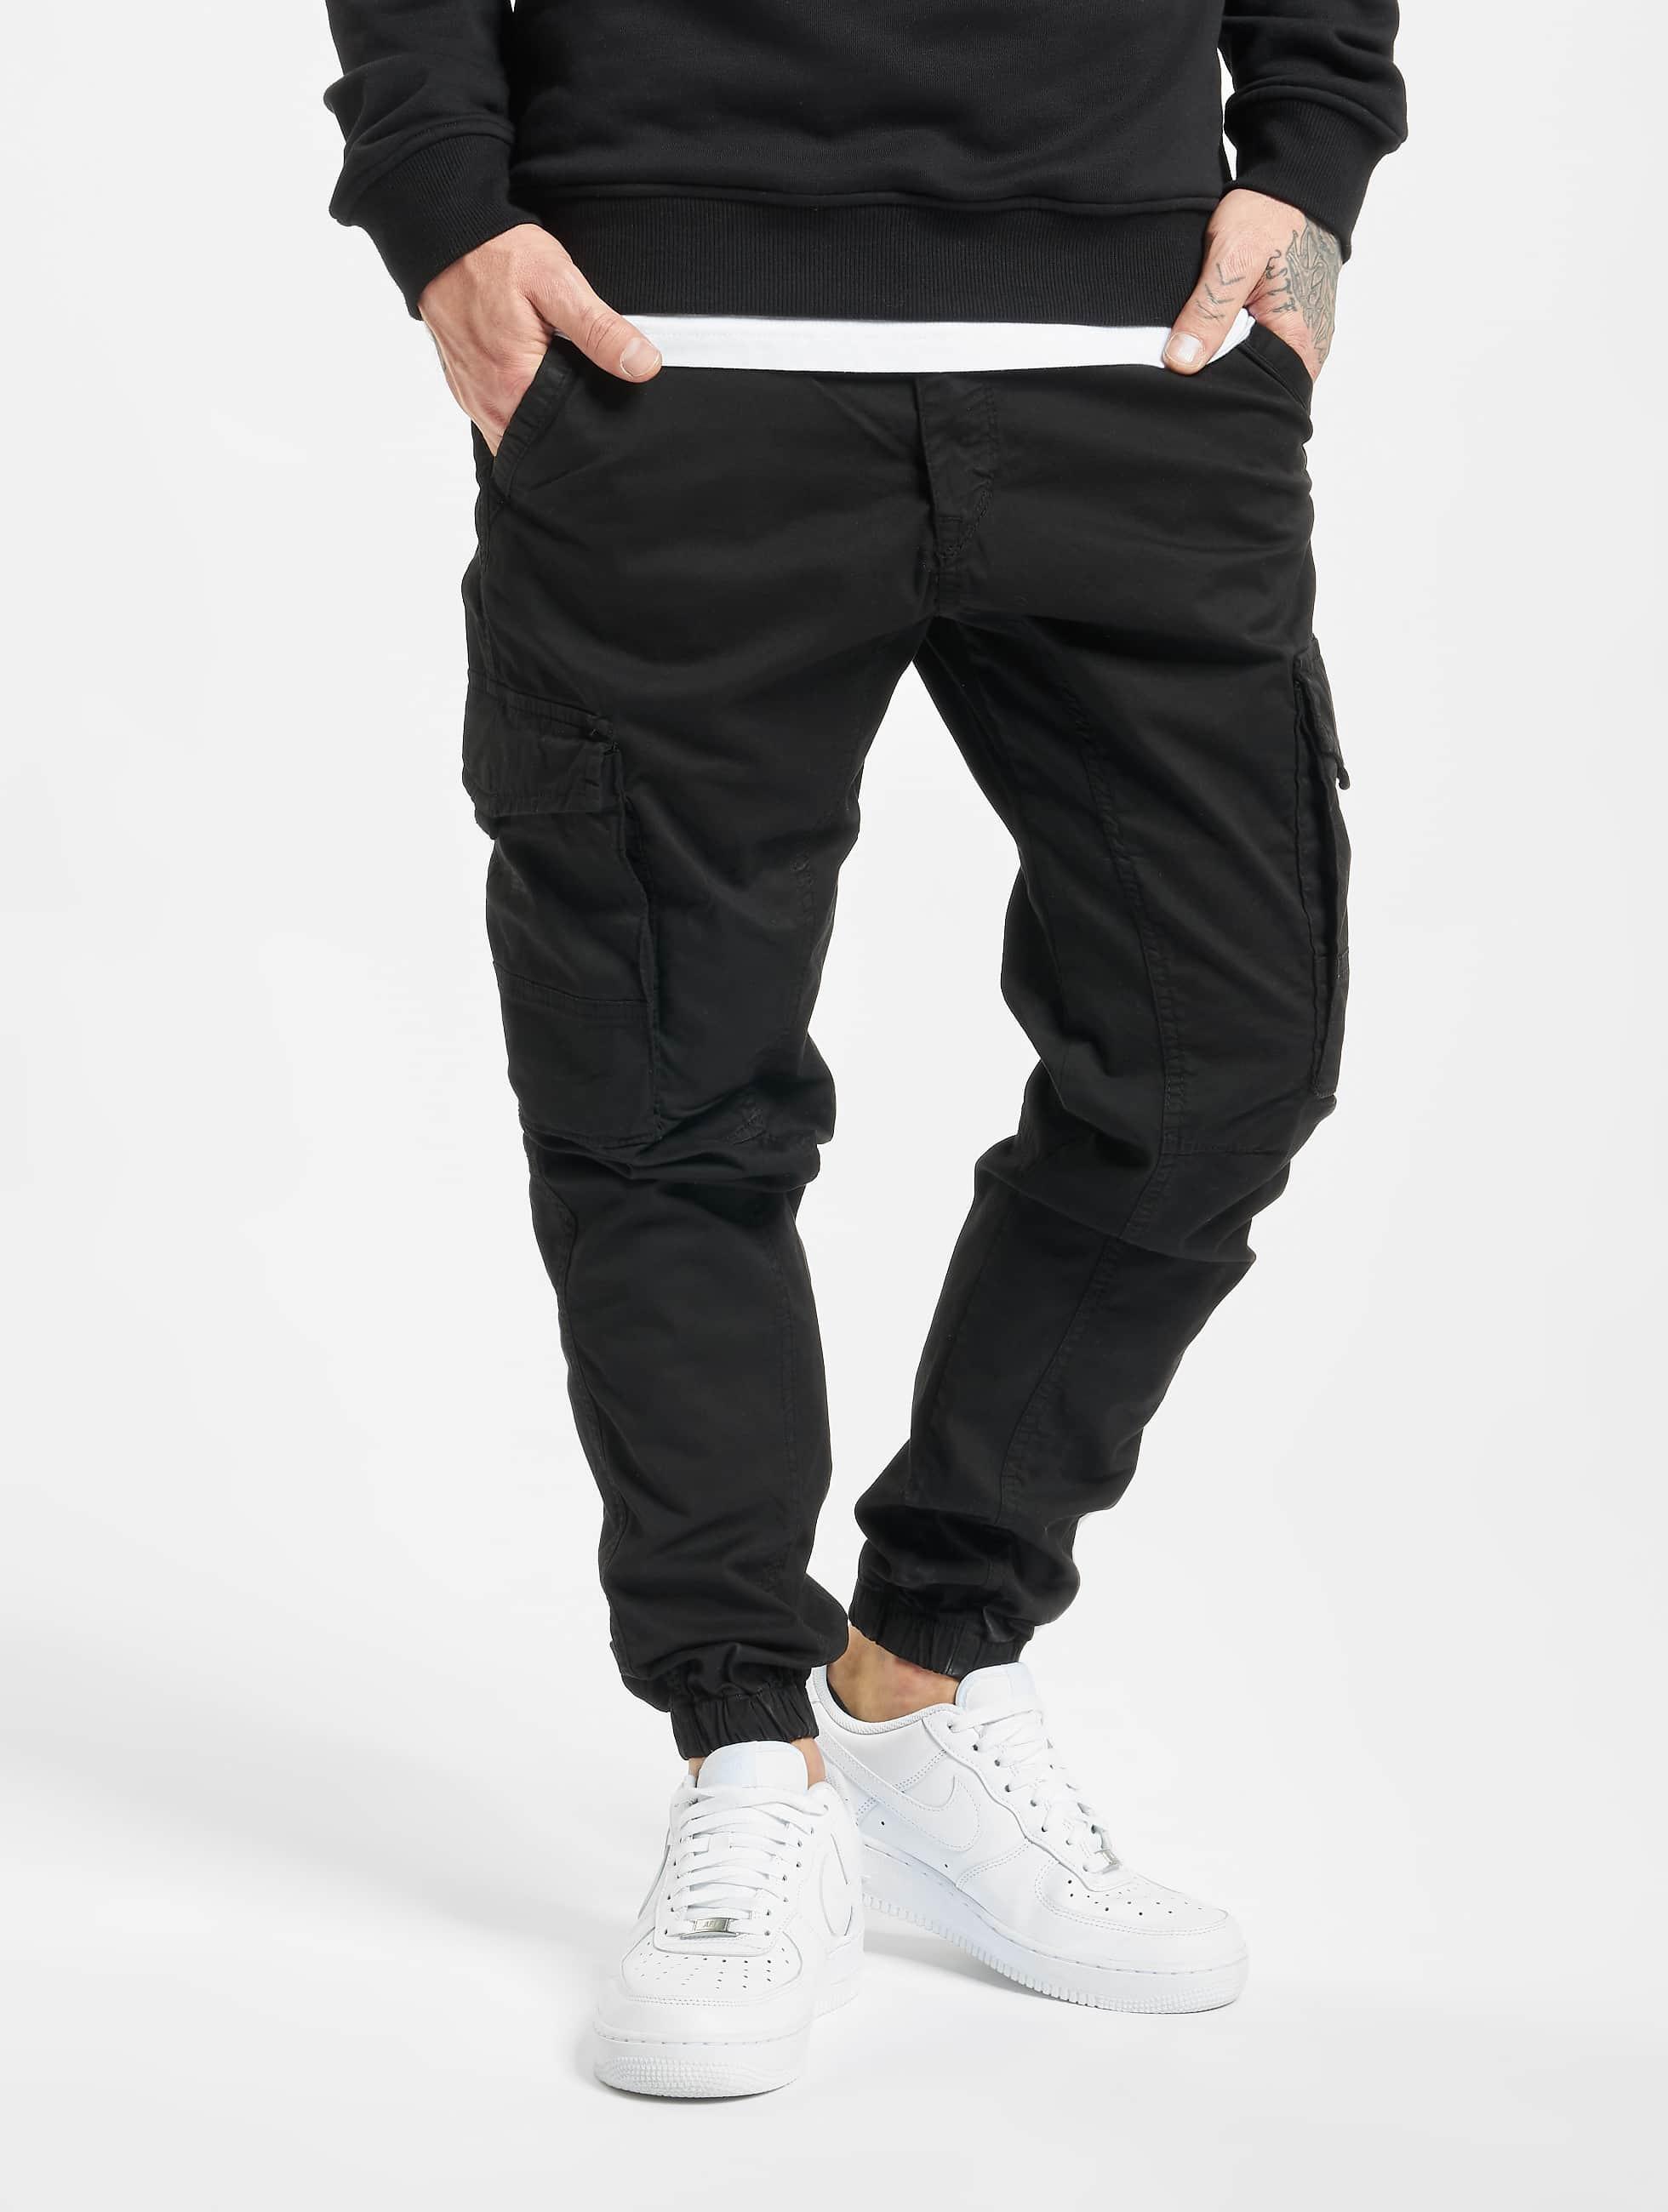 DEF / Slim Fit Jeans Pete in black W 33 L 34